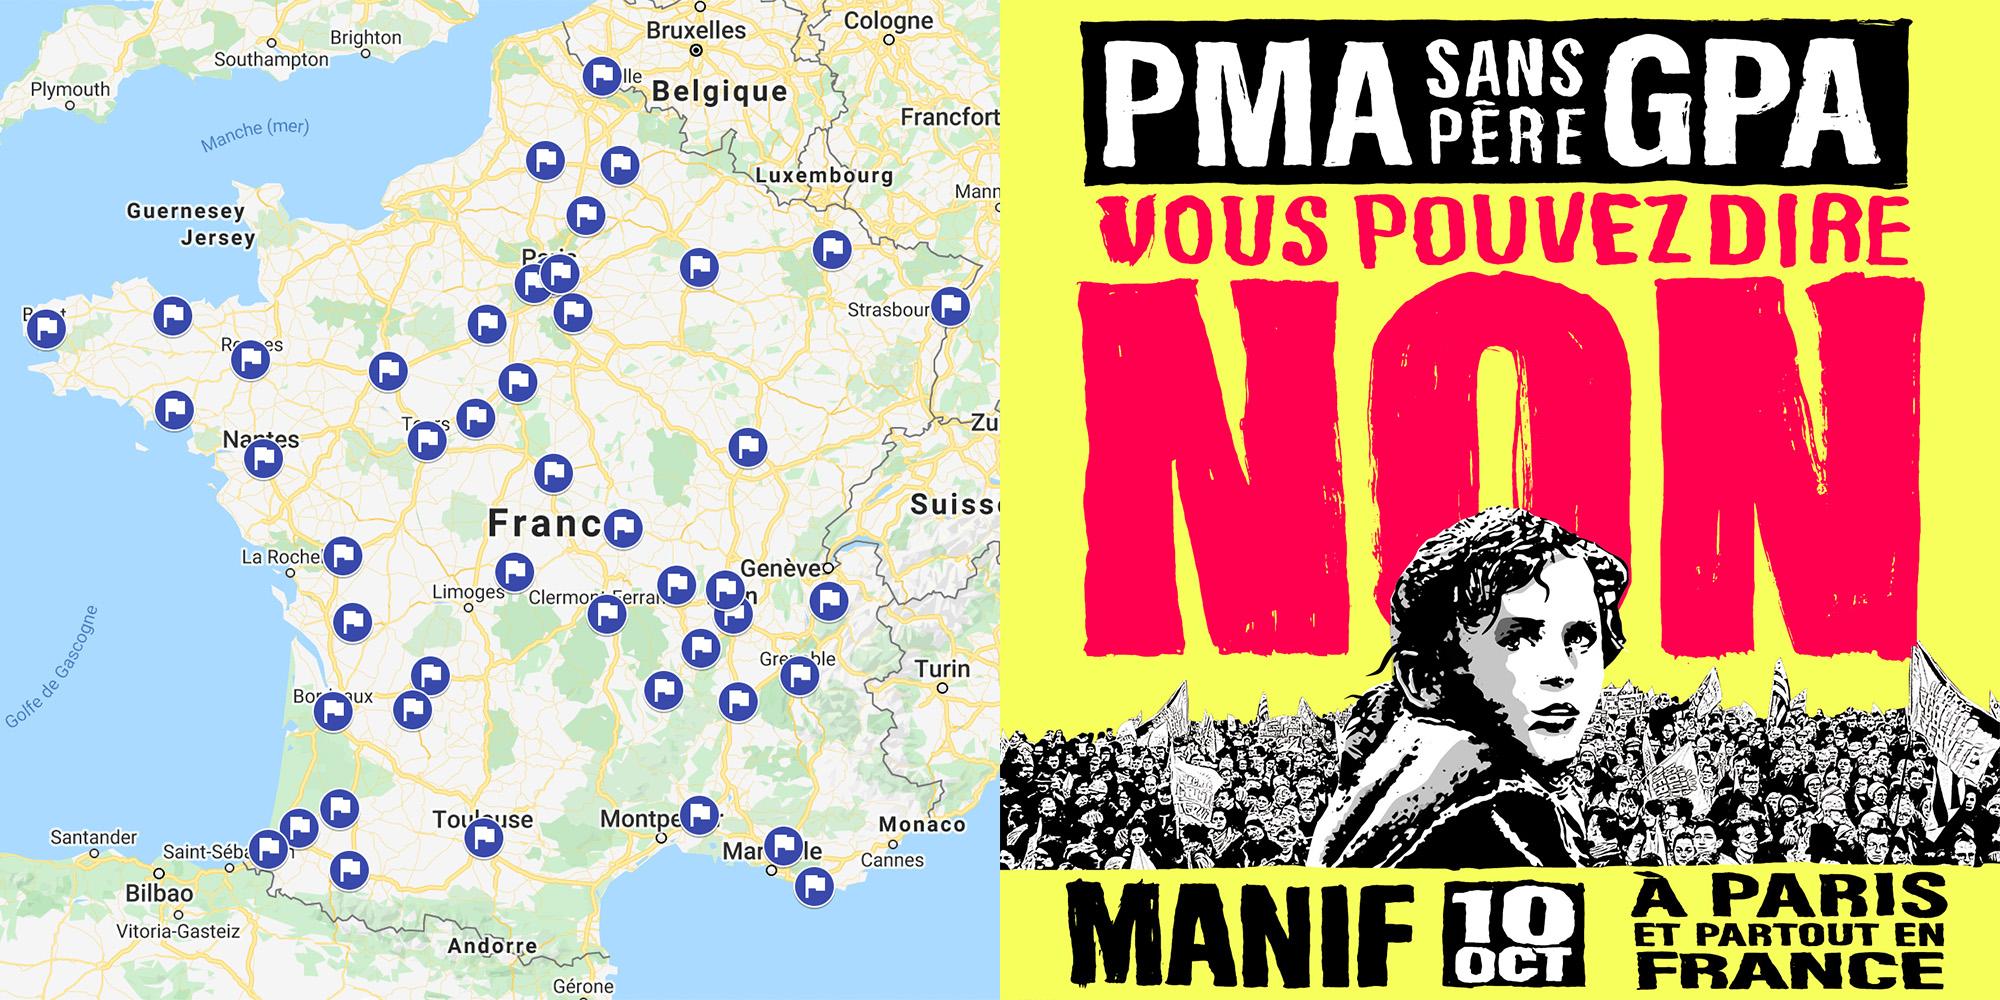 Image - 10 octobre : manifestations partout en France